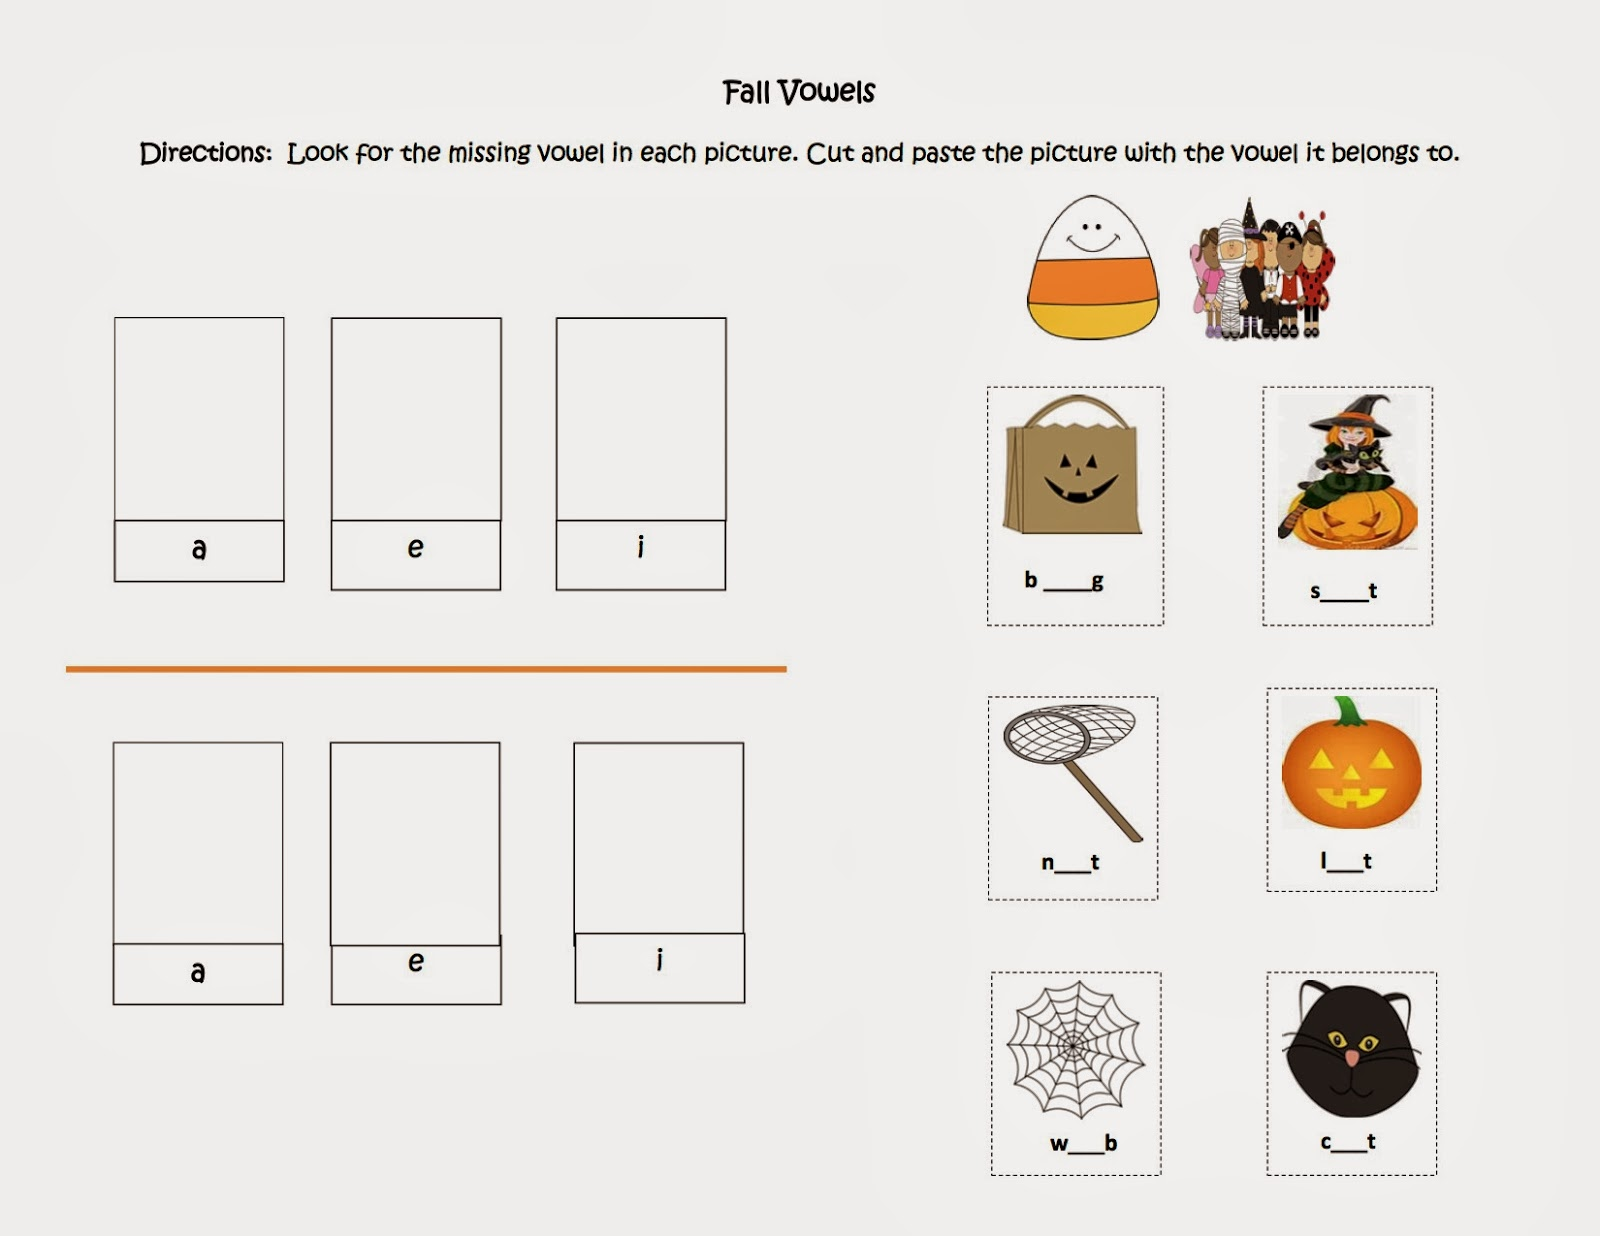 cvc worksheet new 403 cvc sentence writing worksheets. Black Bedroom Furniture Sets. Home Design Ideas